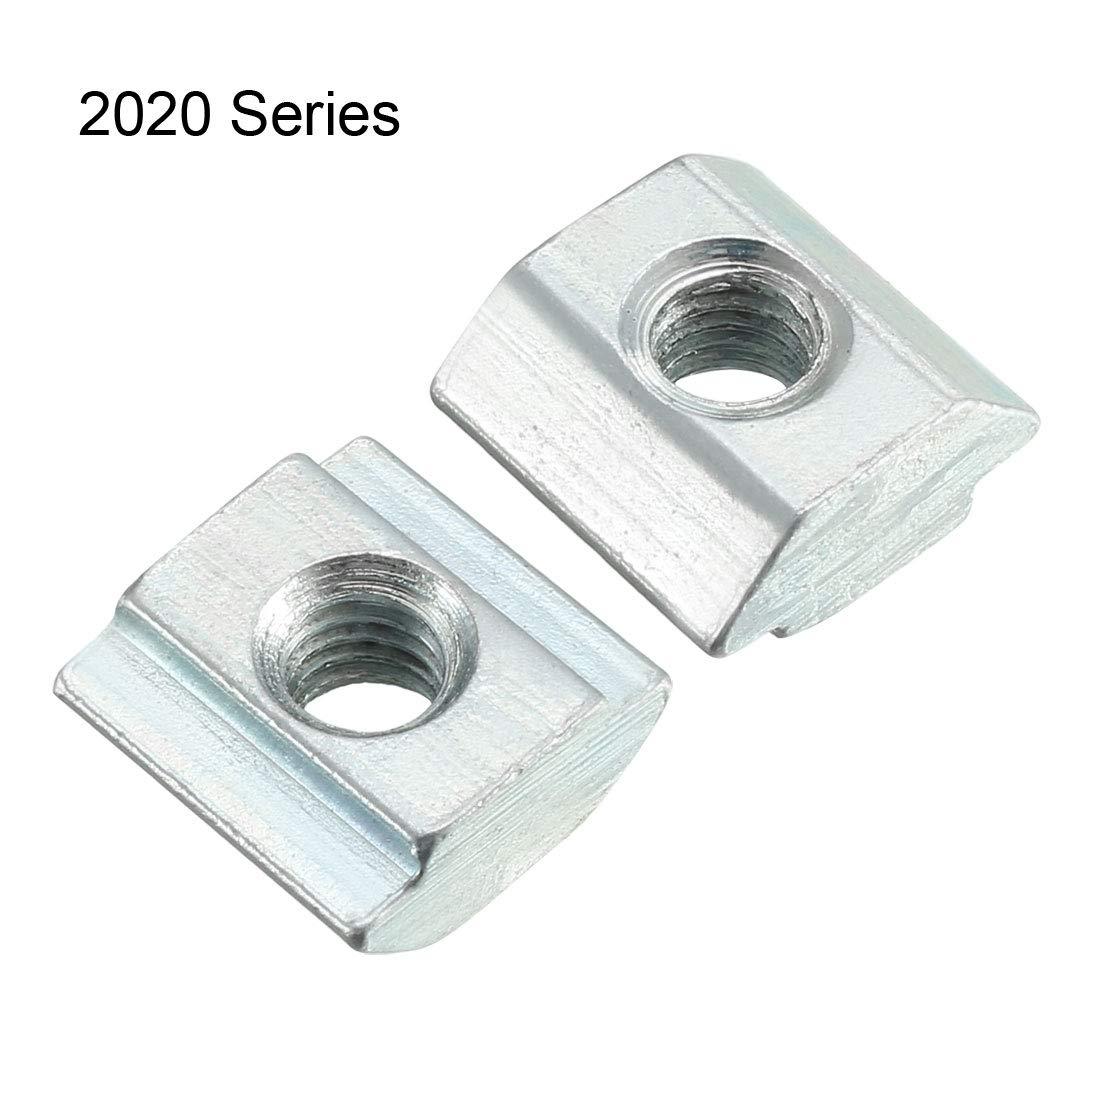 TOOGOO R 10Pcs 80//20 Inc T-Slot Hardware 40 Series M8 Slide In T-Nut T-Nut